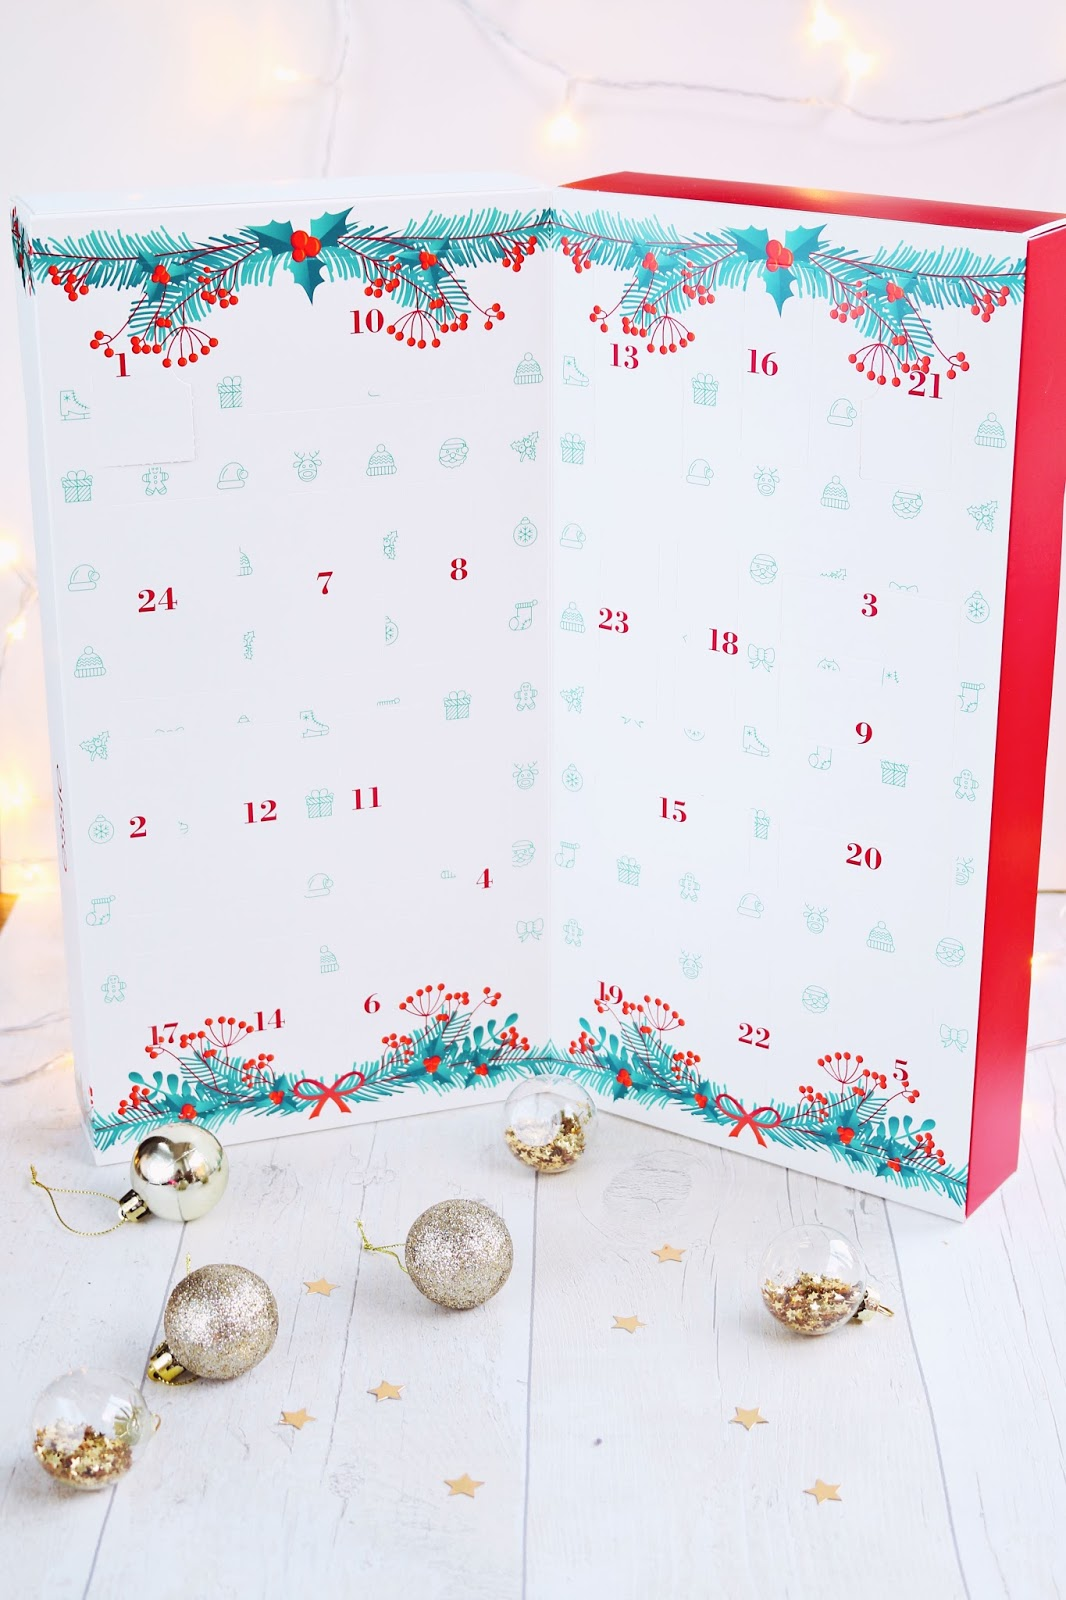 Beauty, Christmas, Drugstore, essie, Nails, essie advent calendar, essie advent calendar 2017, essie advent calendar review, essie nail polish, essie christmas nails,